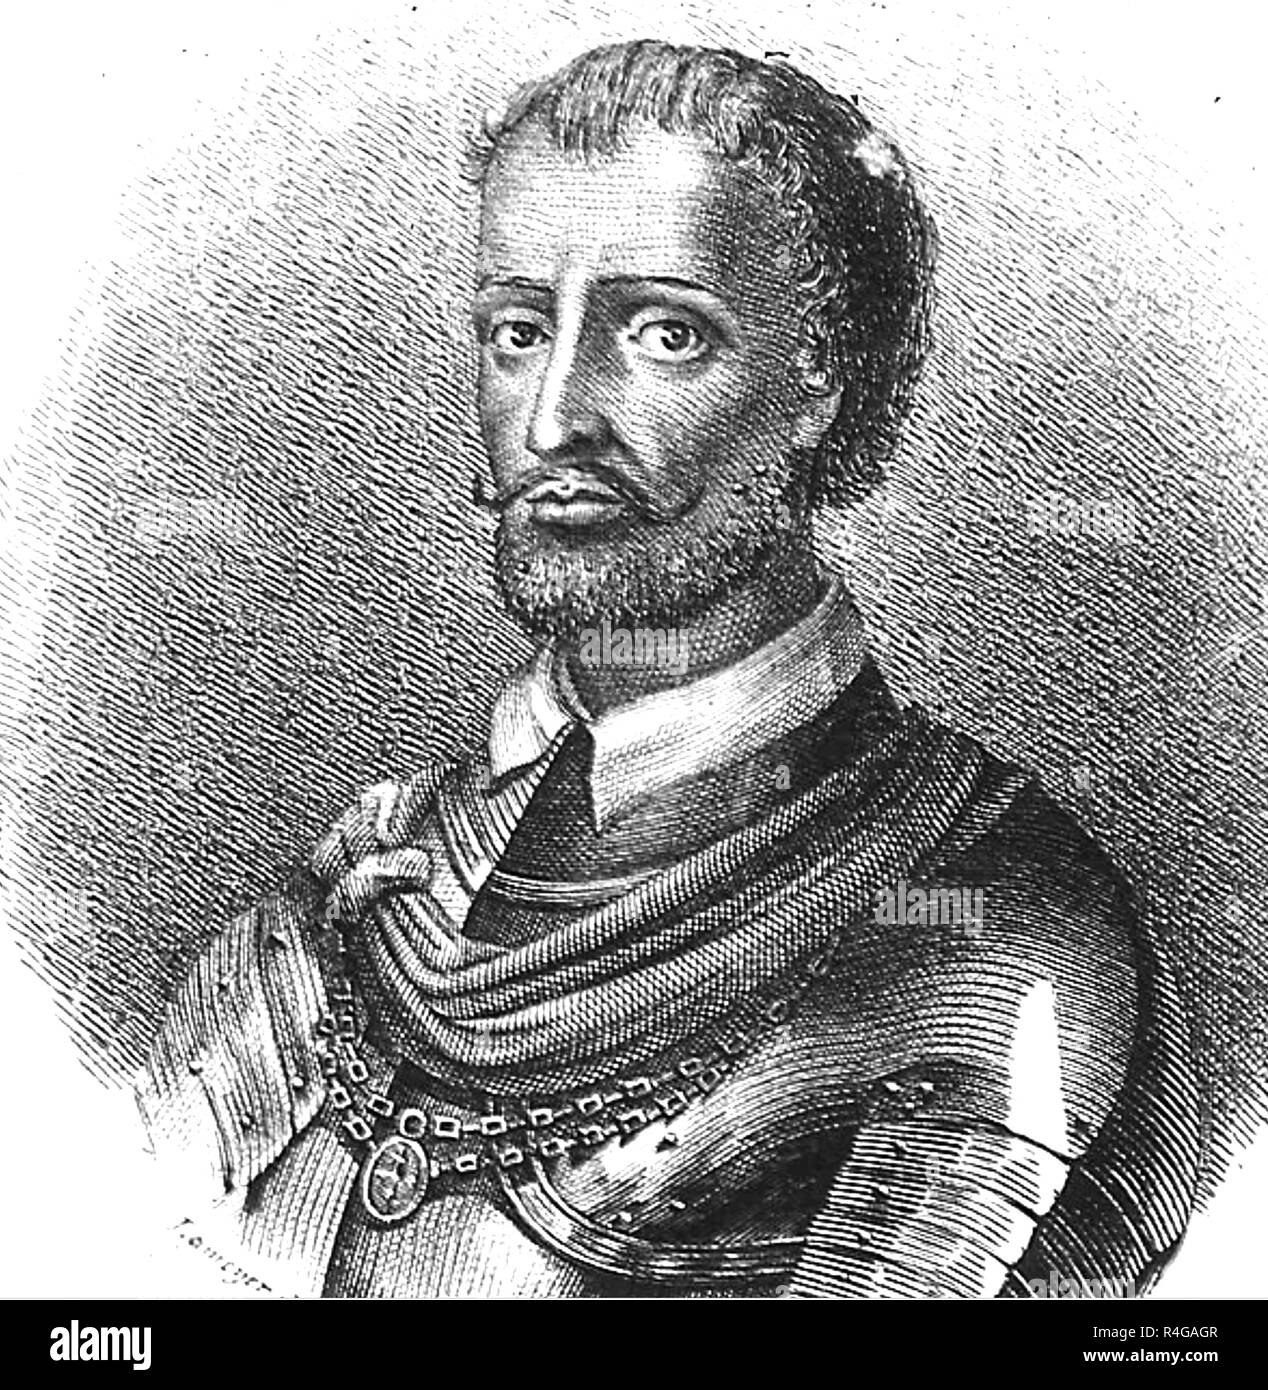 DIEGO HURTADO de MENDOZA (1503-1575) Spanish novelist, diplomat and historian - Stock Image